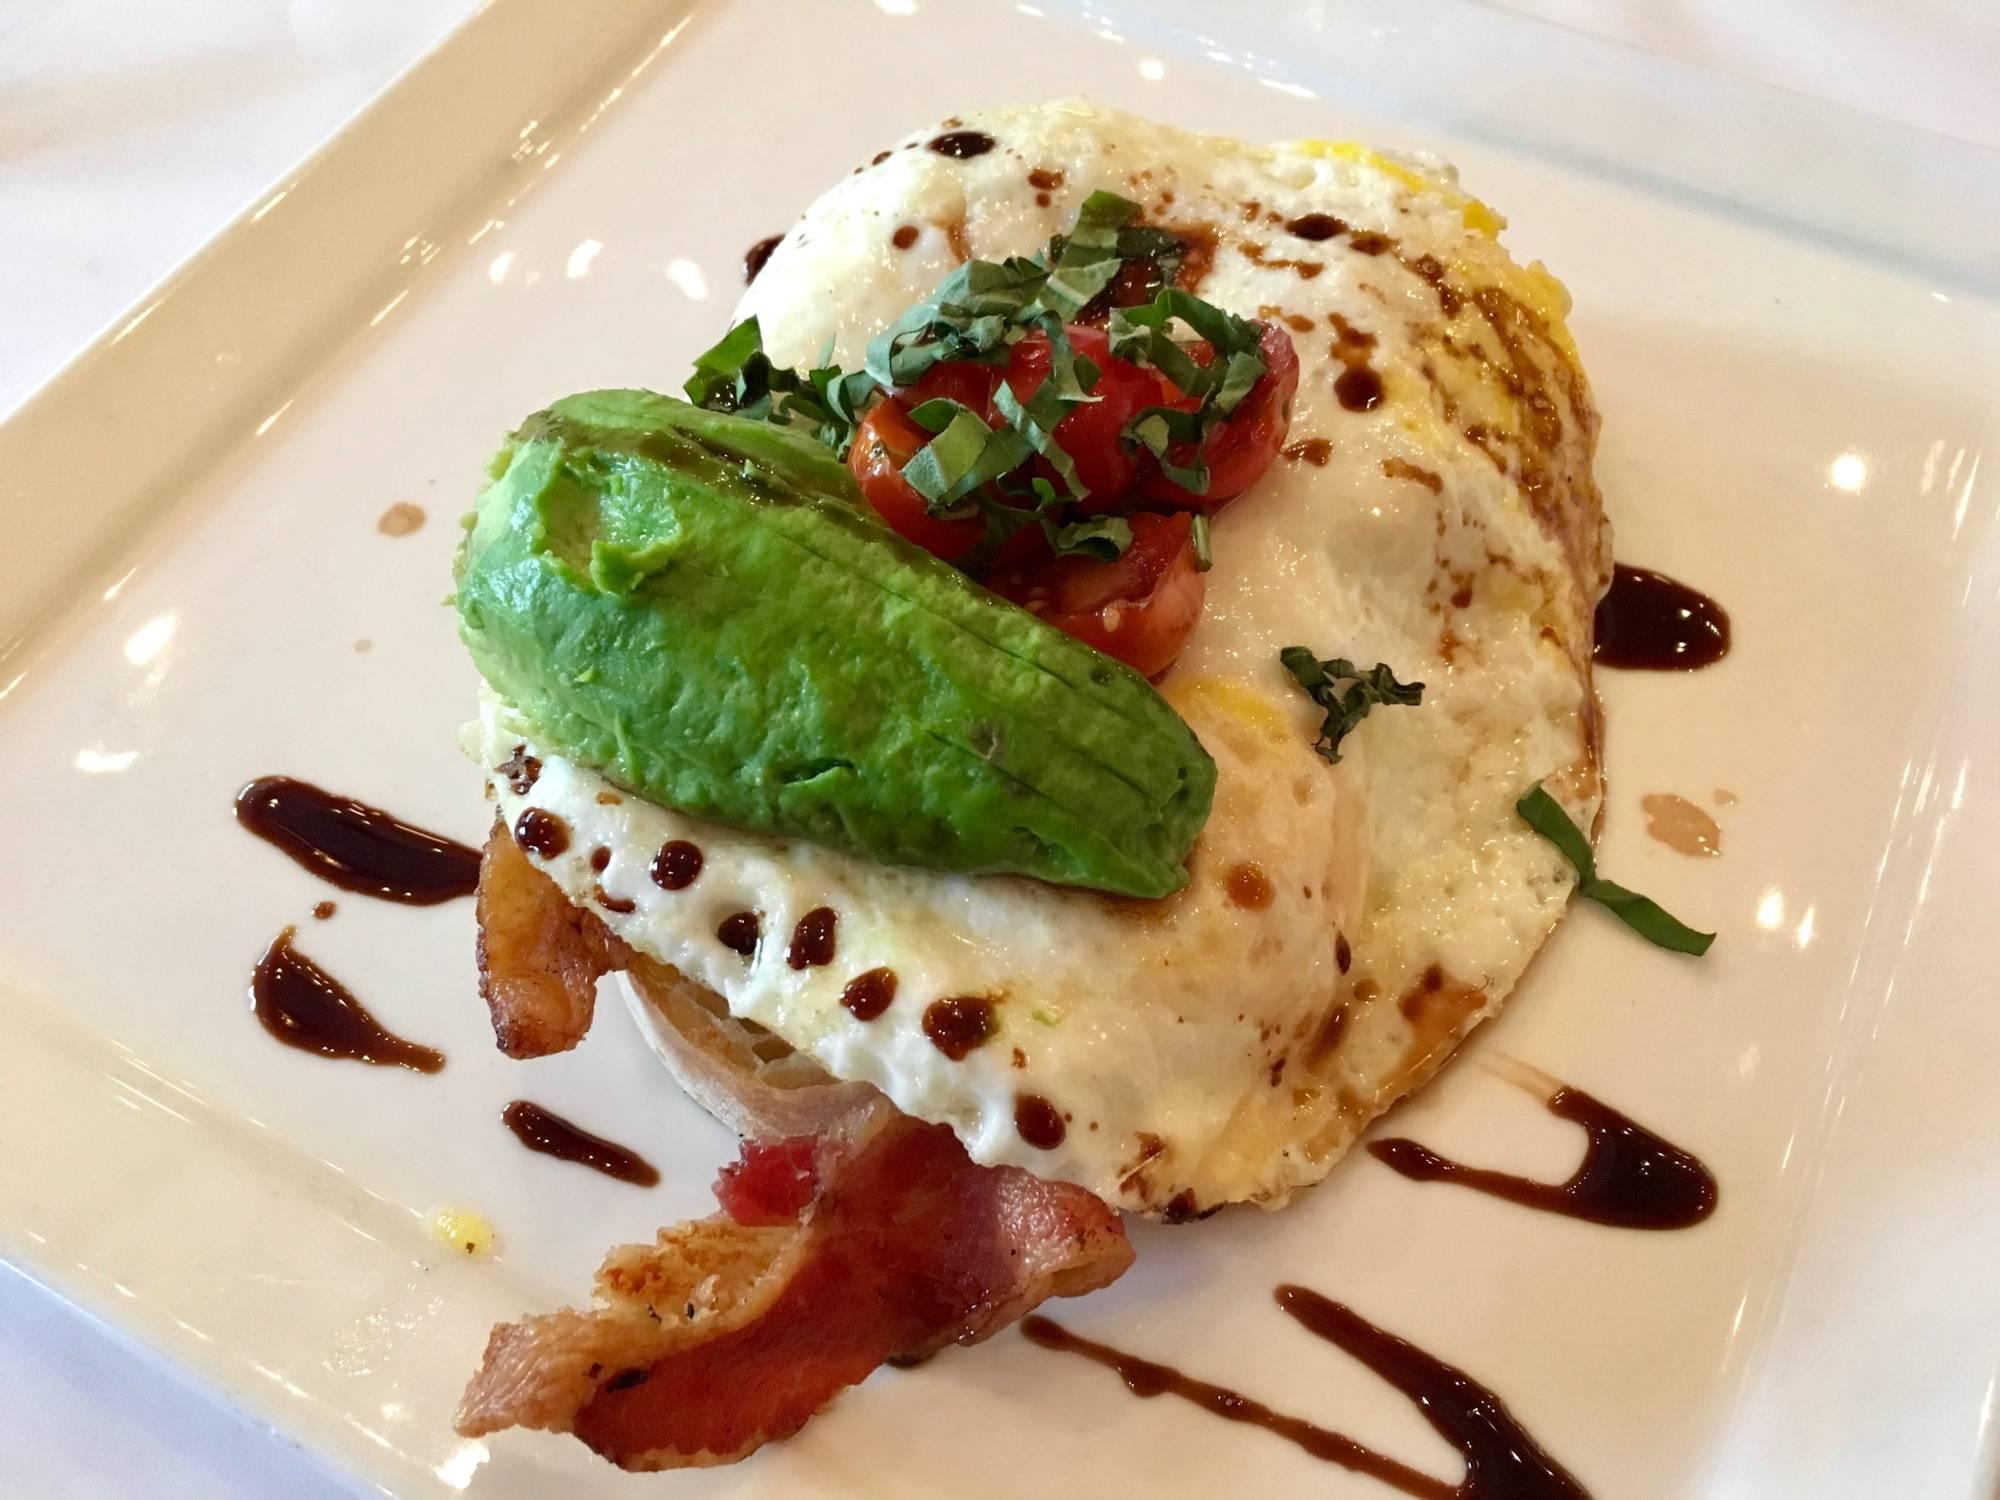 The Egg Bruschetta at Village California Bistro and Wine Bar.